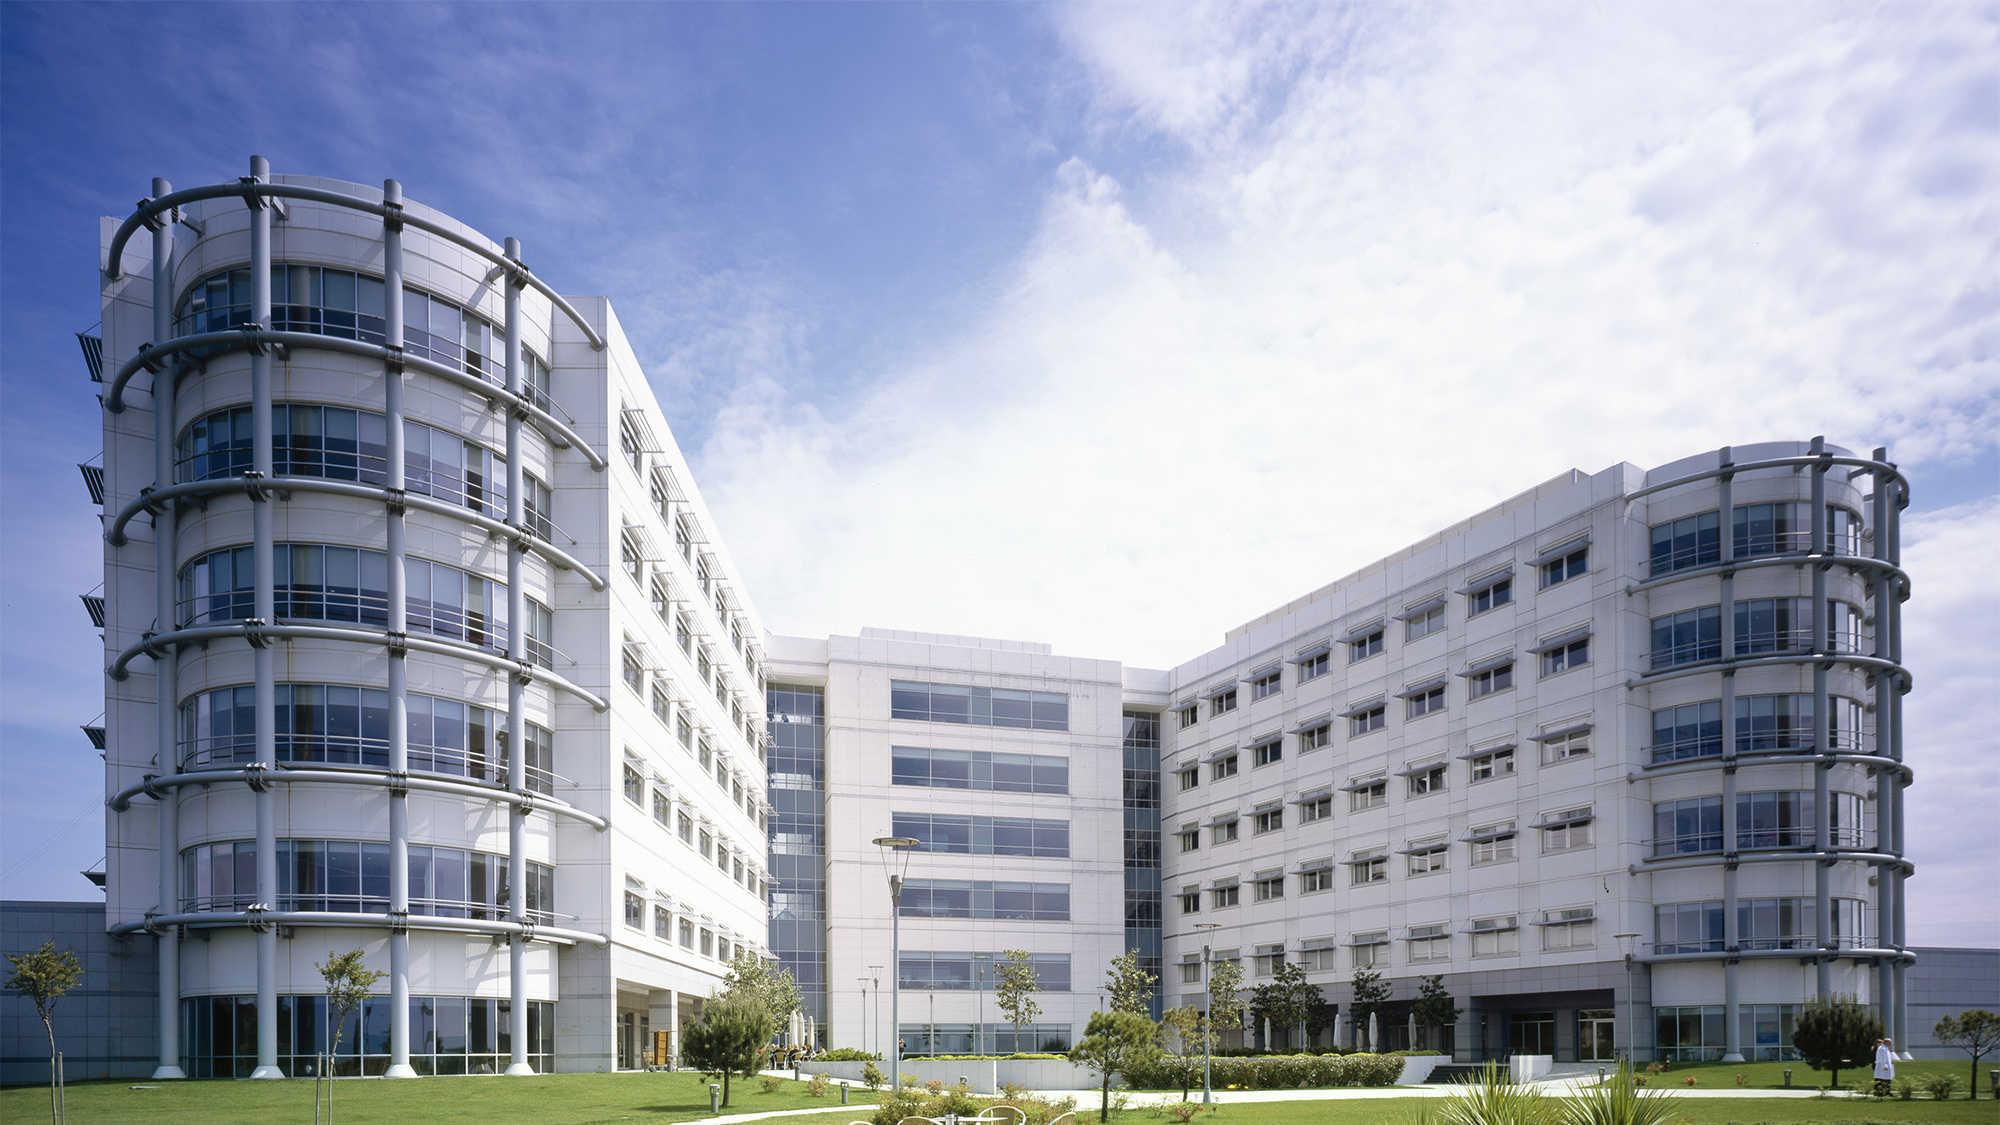 Anadolu hospital